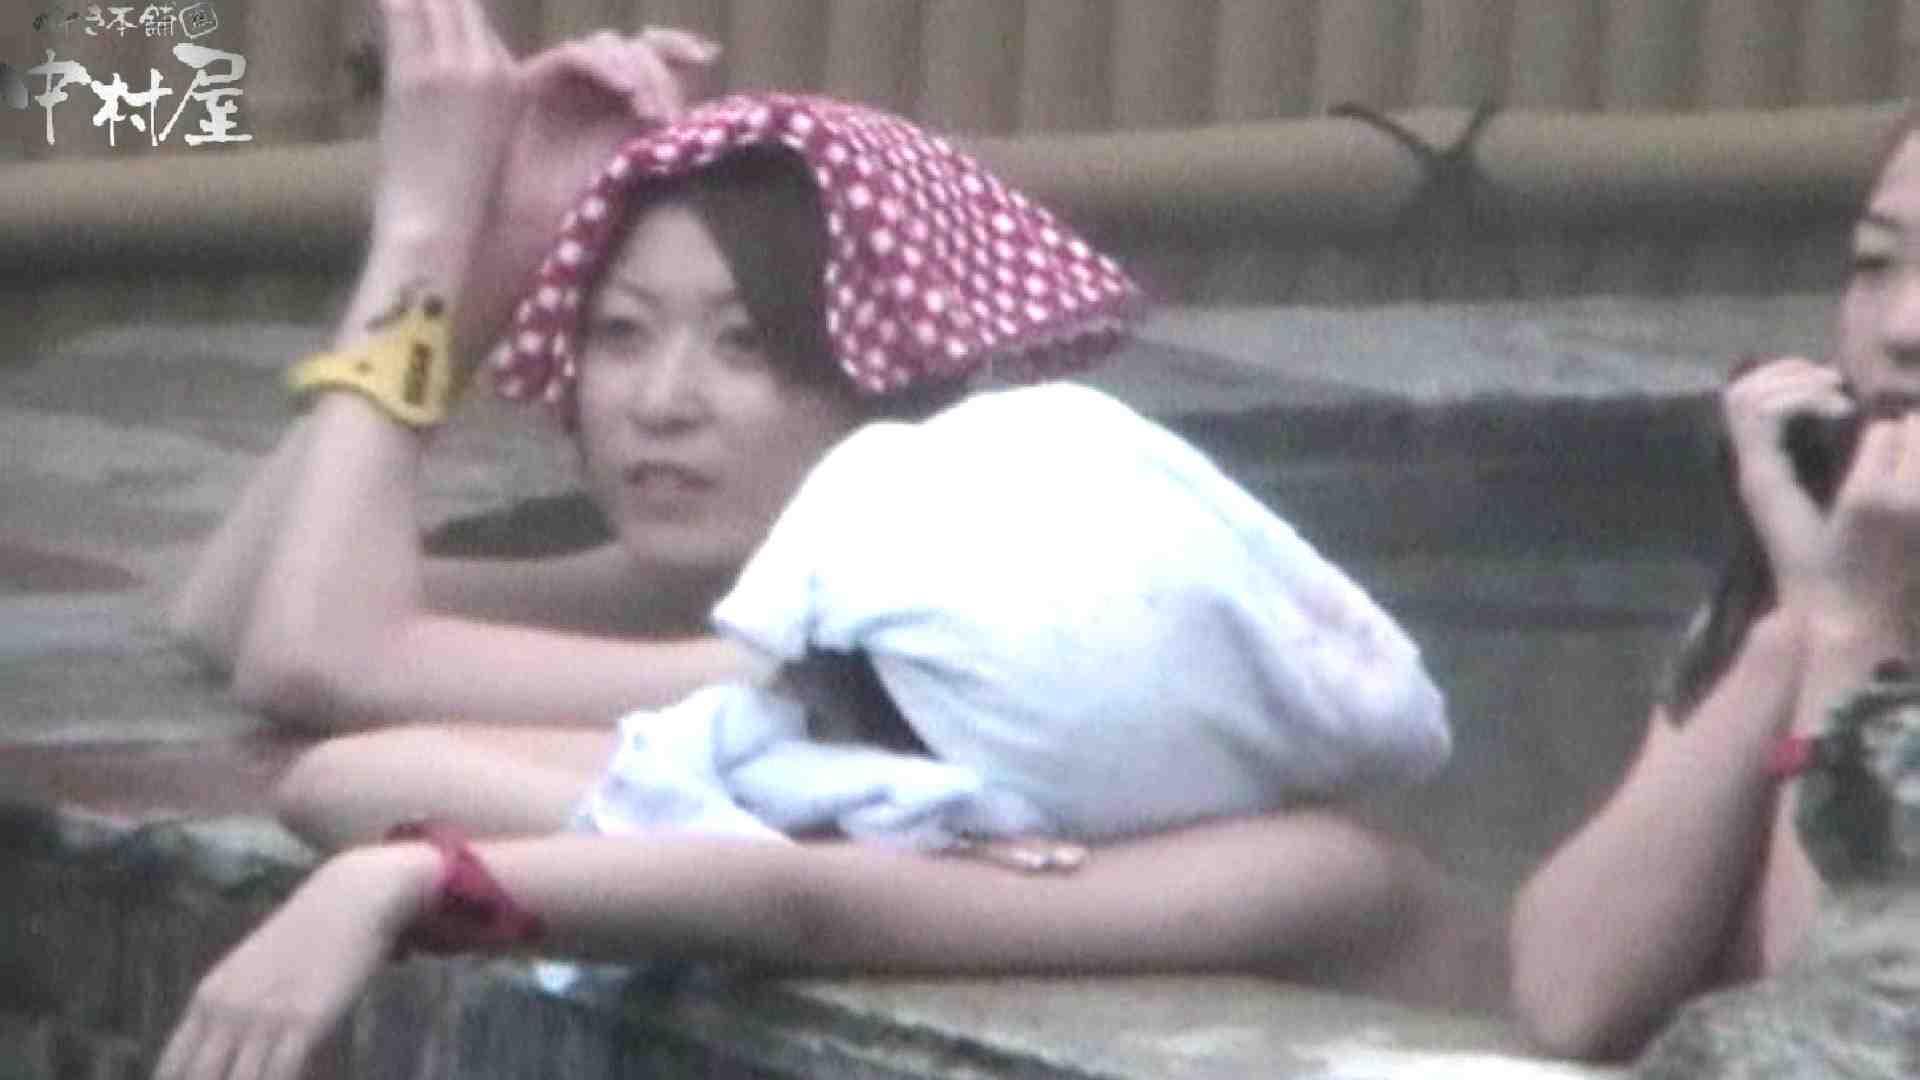 Aquaな露天風呂Vol.554 盗撮 濡れ場動画紹介 24連発 23